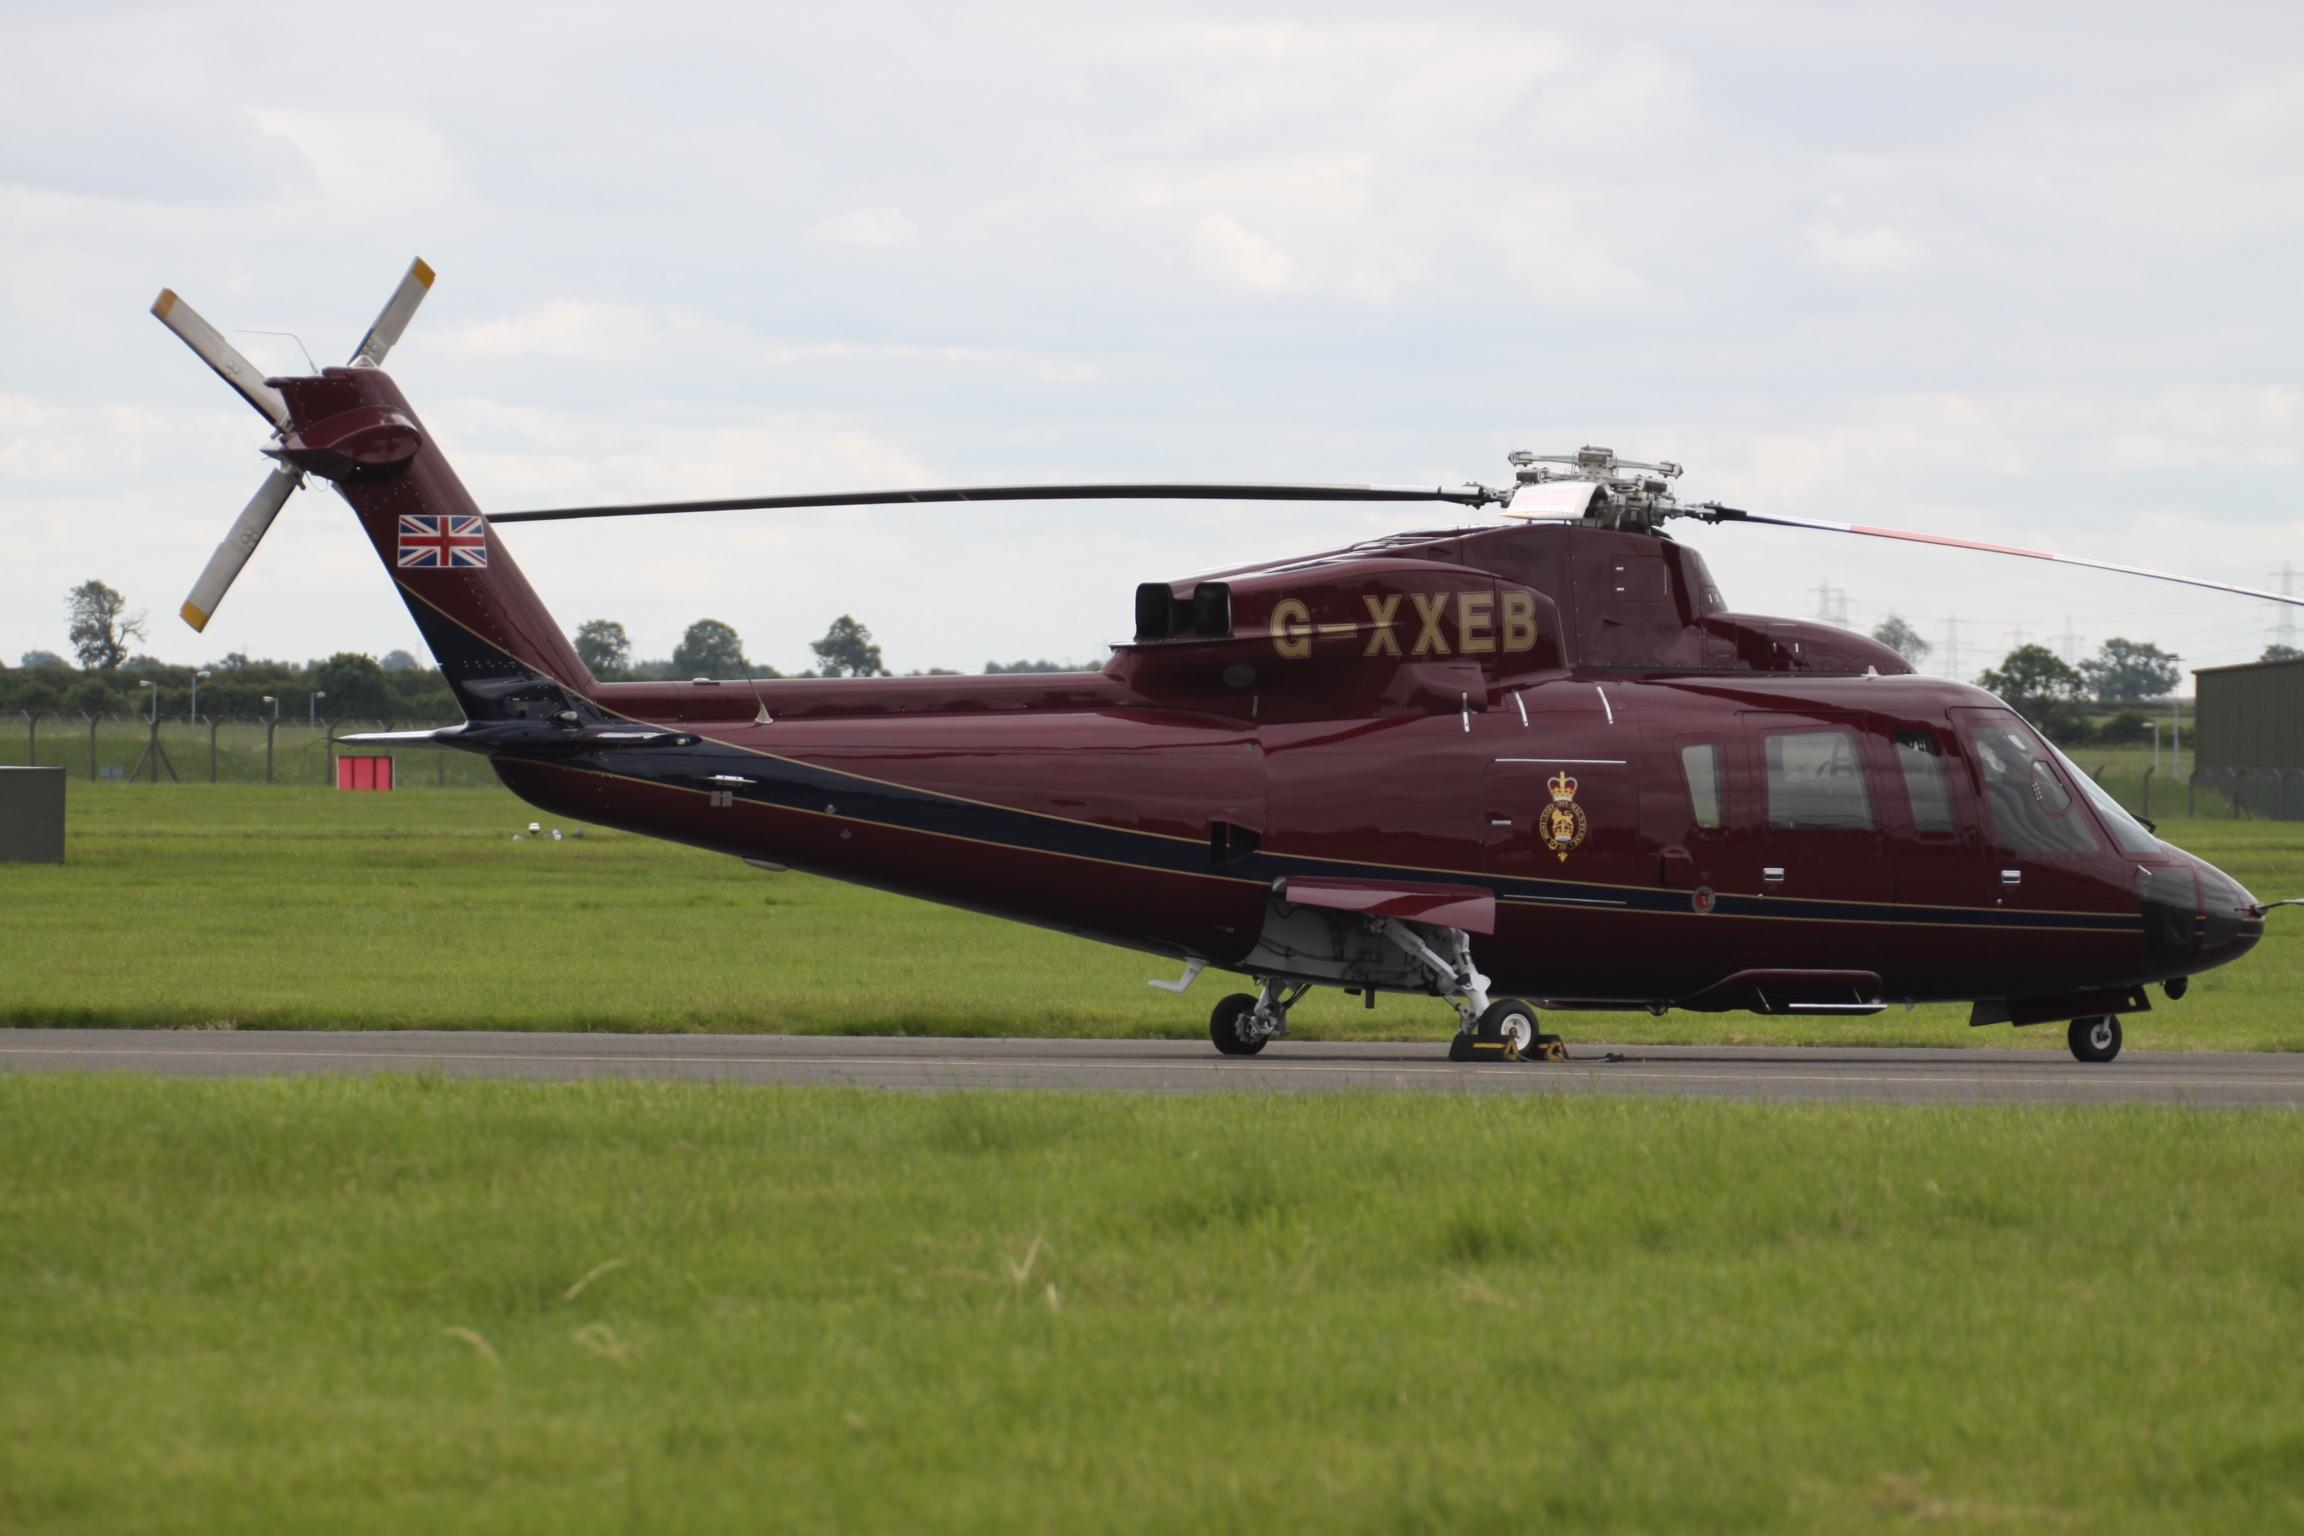 Elicottero Sikorsky : Sikorsky s wiki everipedia